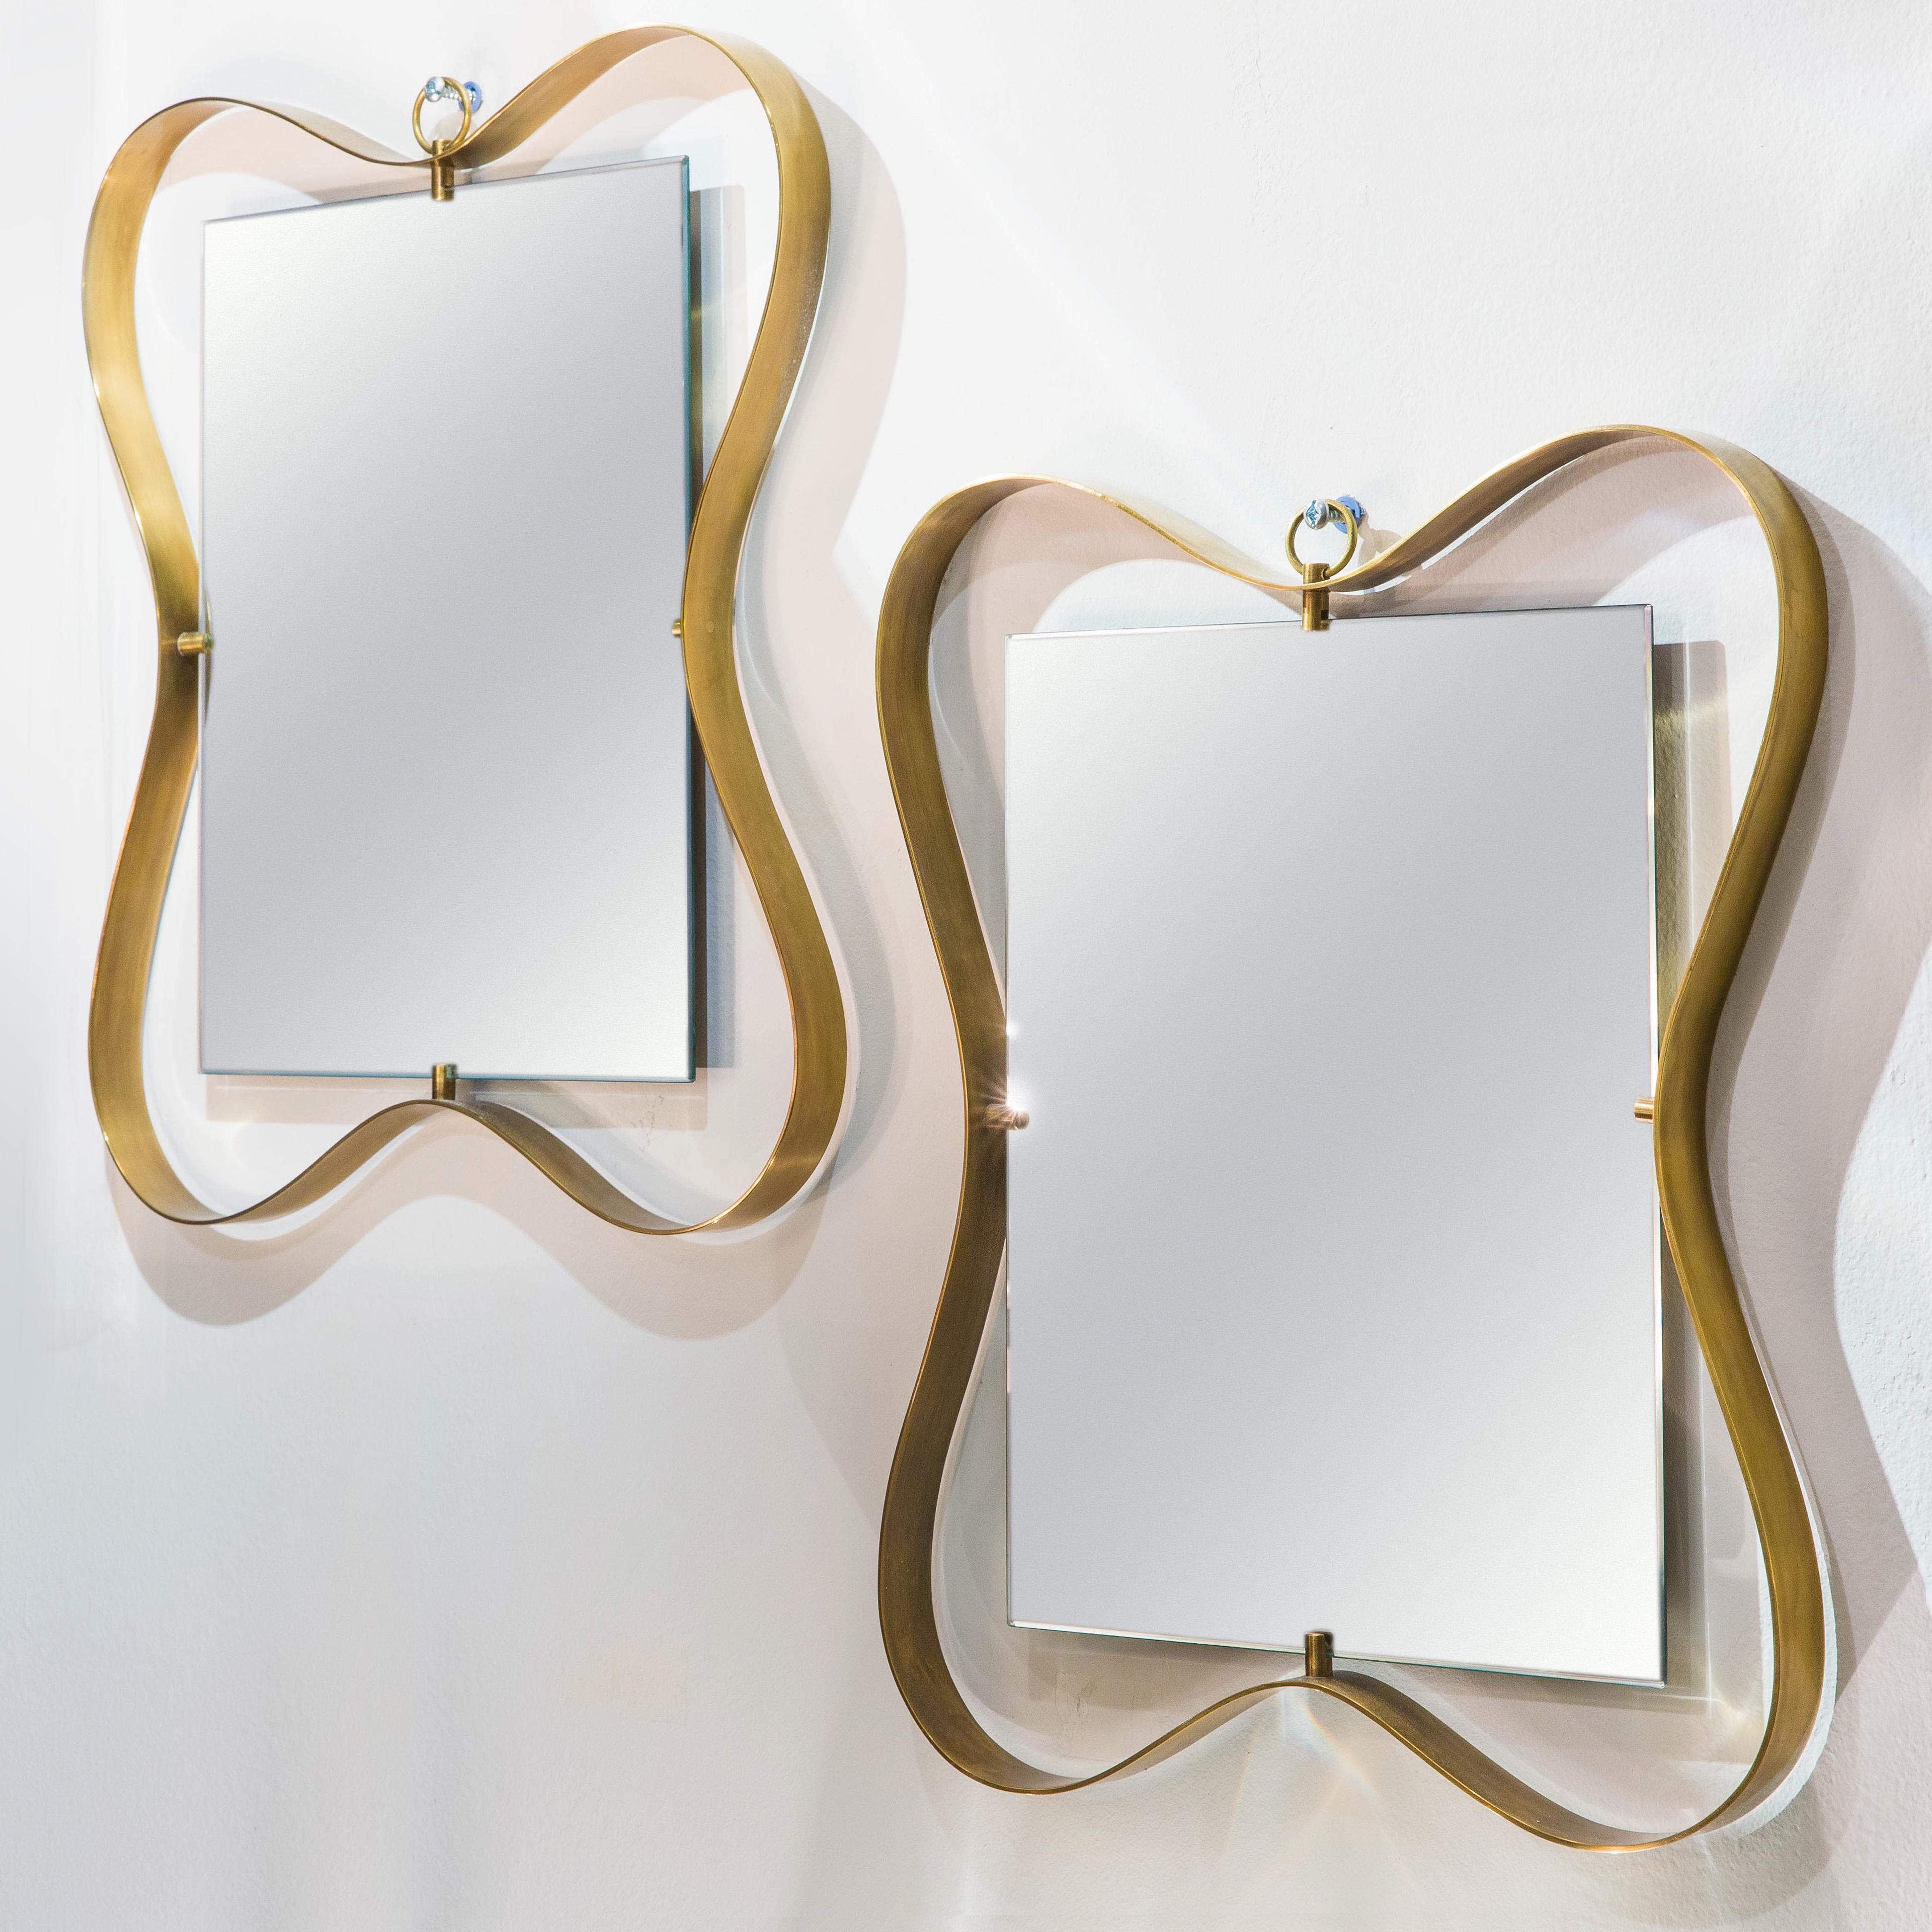 Pair of Small Brass Framed Mirrors by Fontana Arte | soyun k.